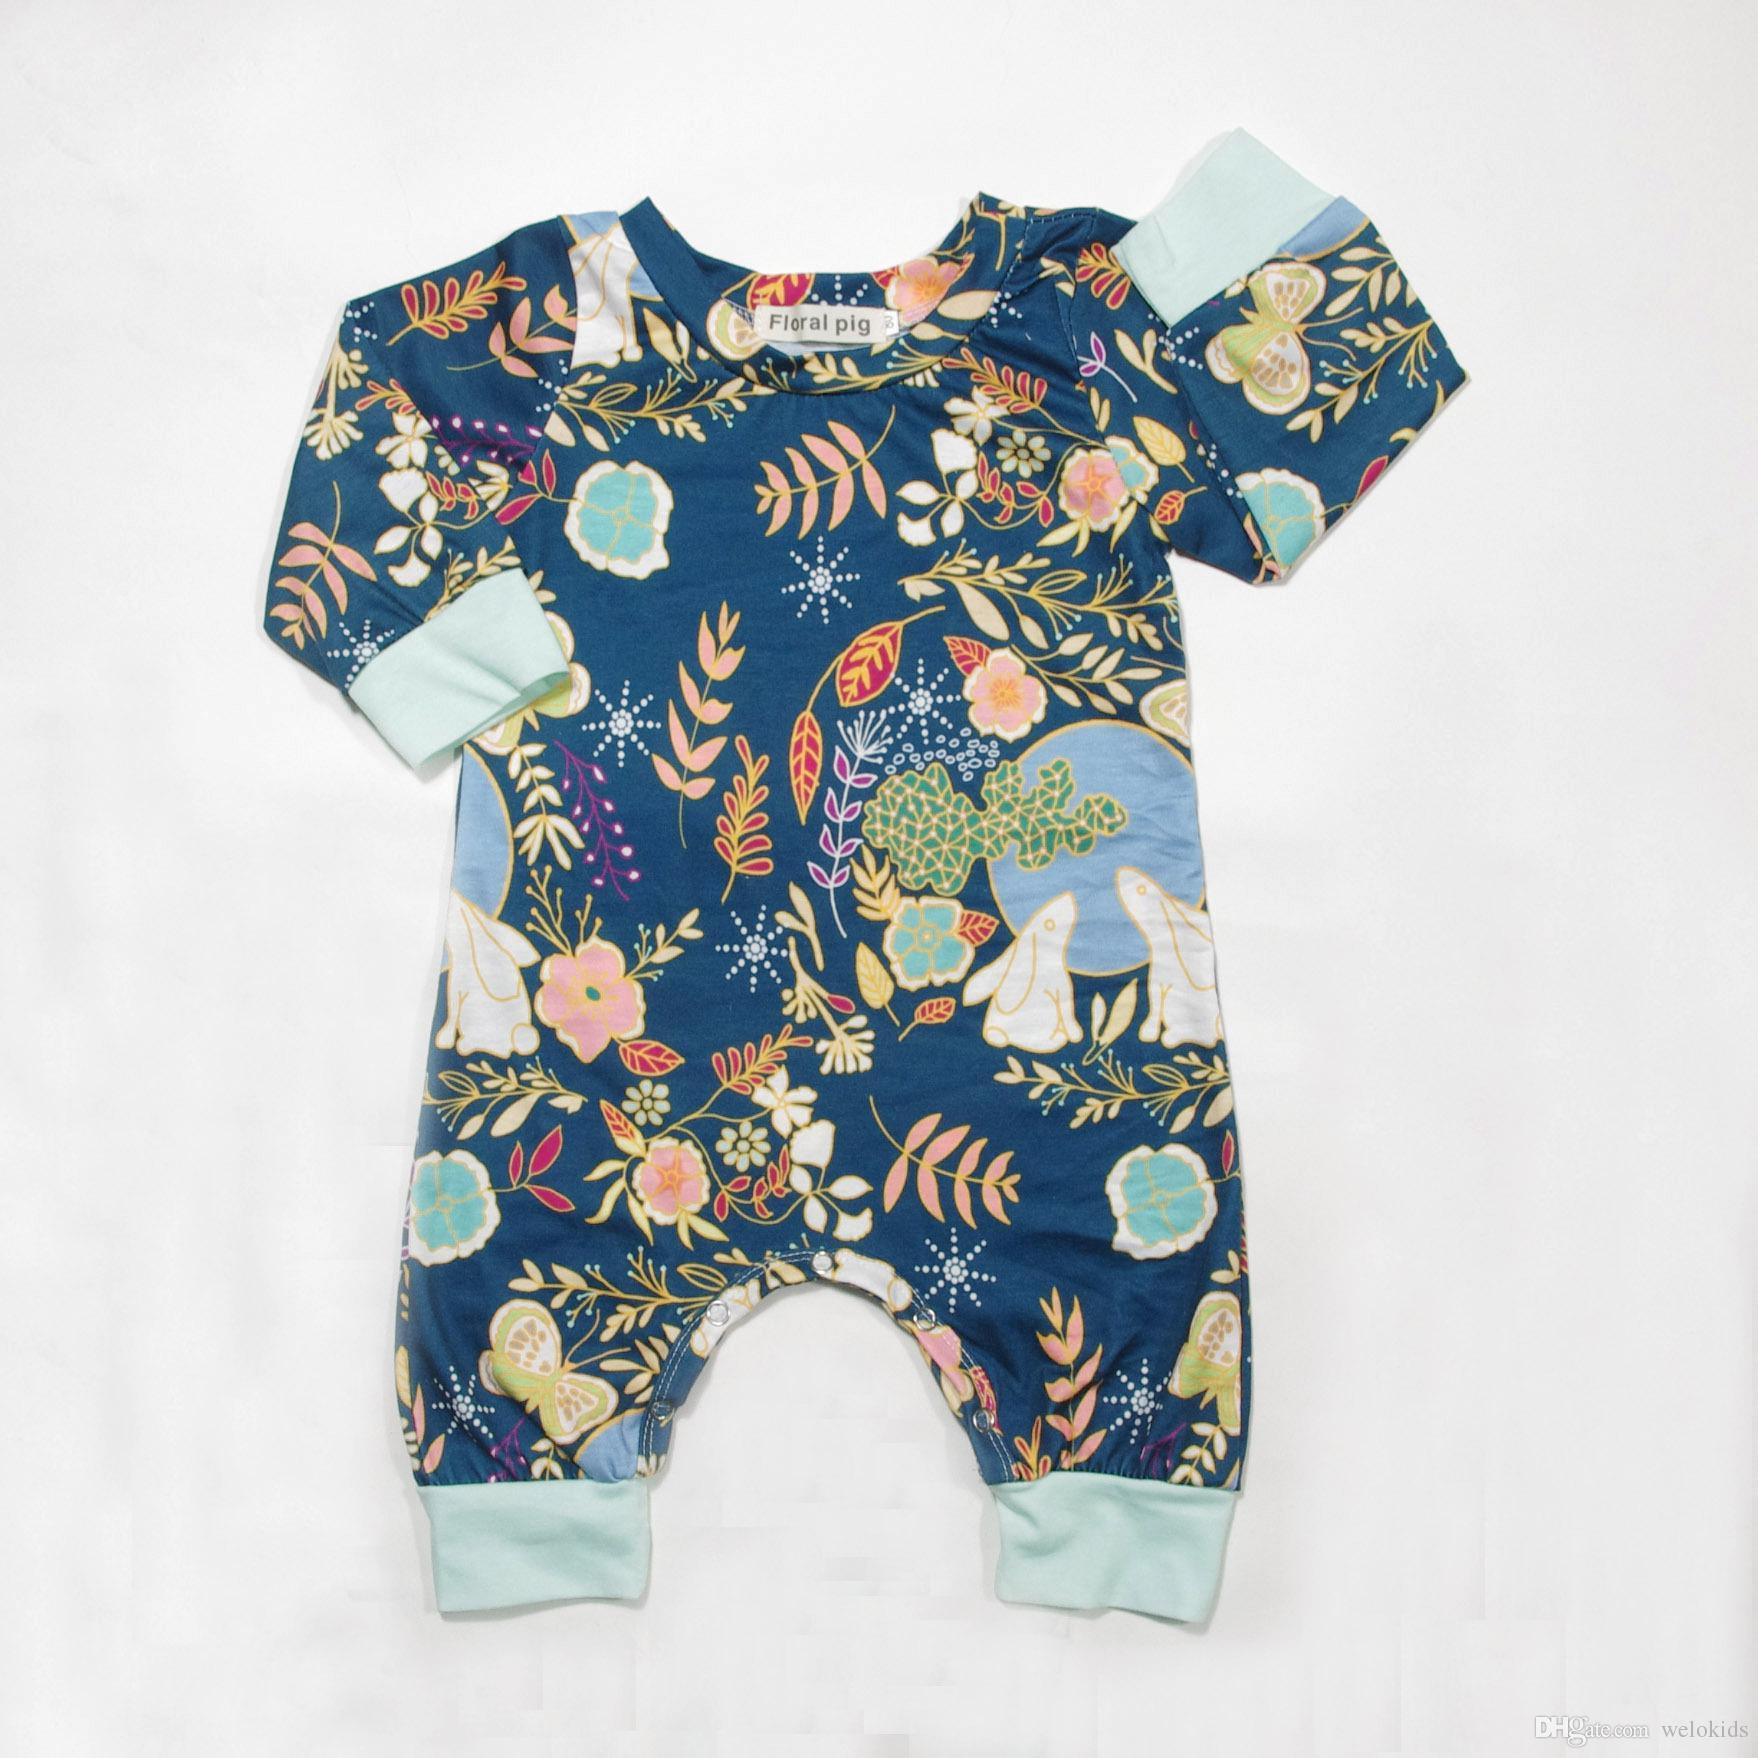 Baby Climbing Clothes Romper Cute Cartoon Pig Infant Playsuit Bodysuit Creeper Onesies Black